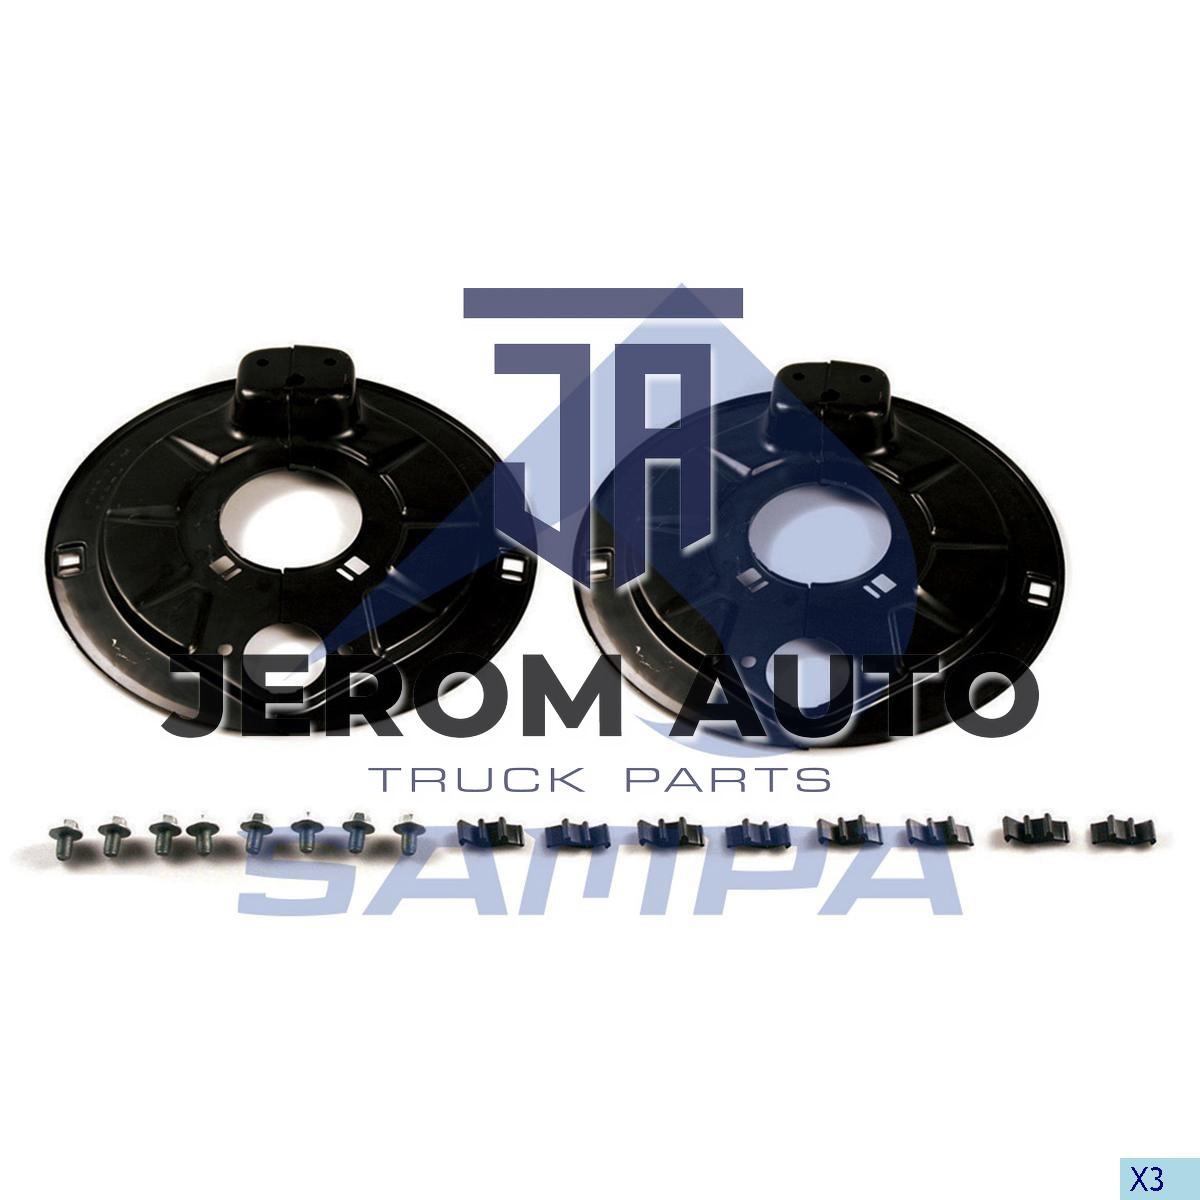 Защита тормозного барабана BPW (d130xd447x63) \0301099690S \ 070.585